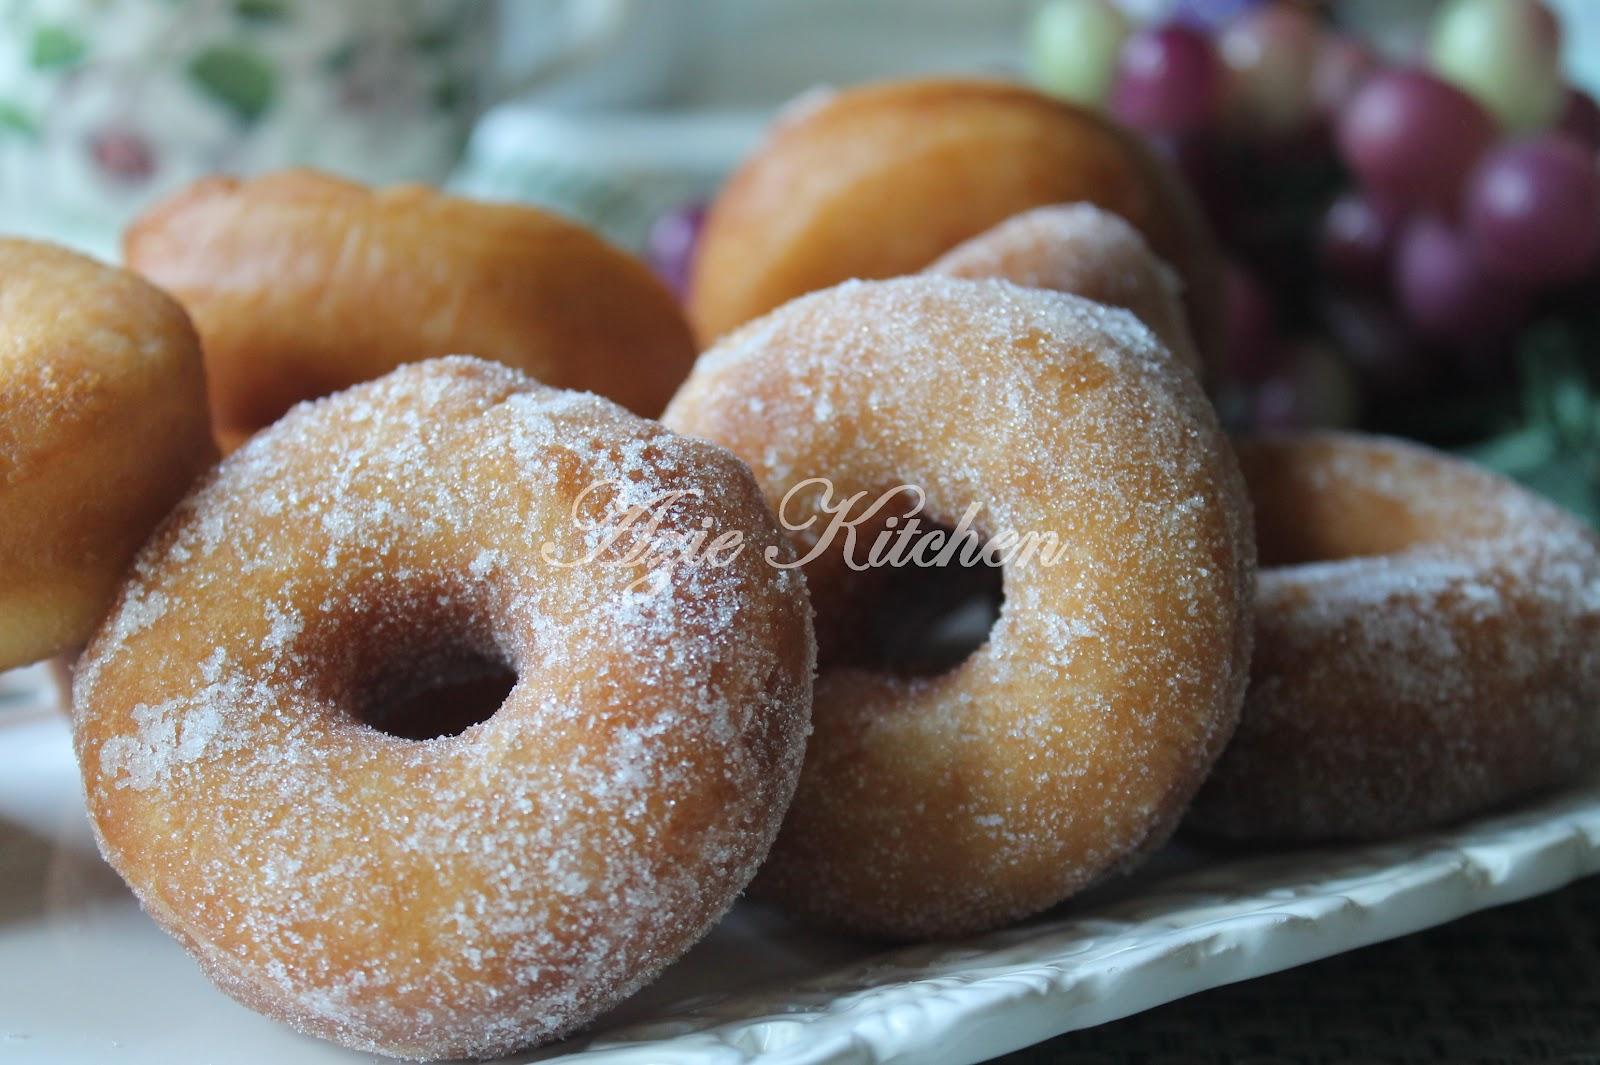 Sinar Kehidupanku Donut Lembut Mudah Membuatnya Knownledge